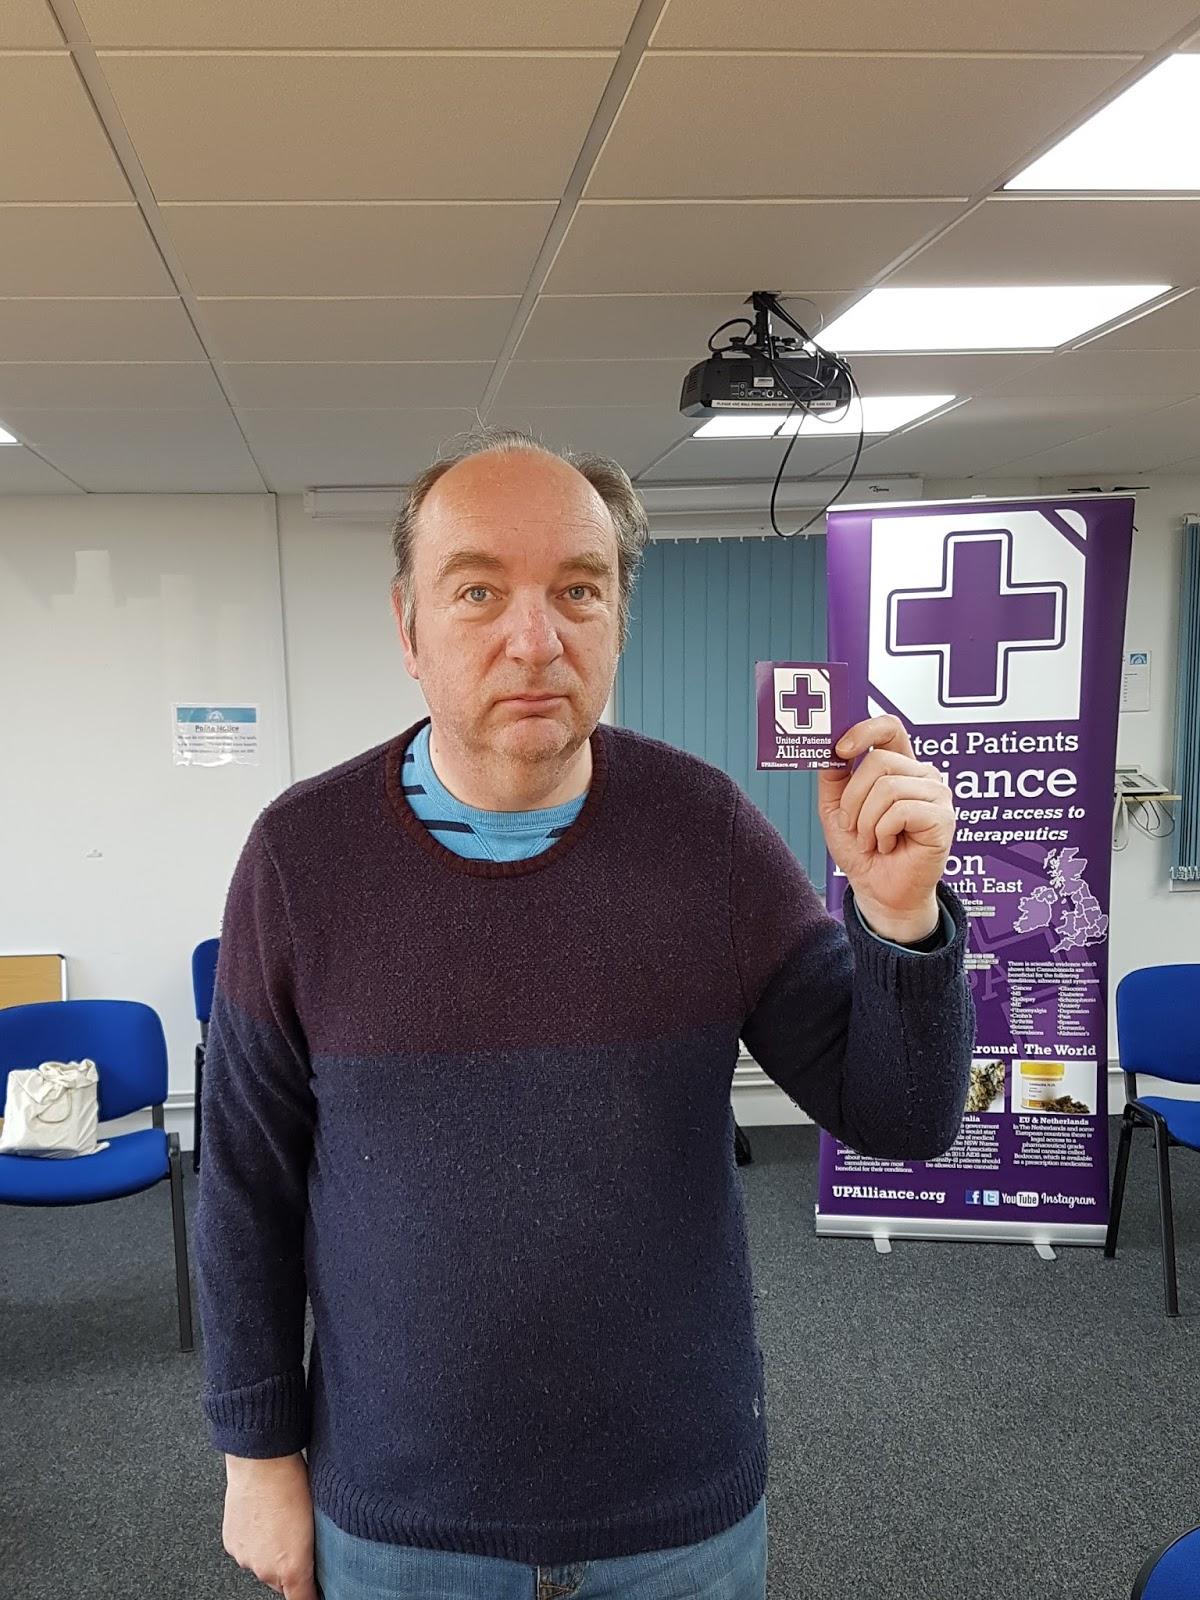 Former UK Government Drugs Minister and LibDem MP for Lewes, Norman Baker